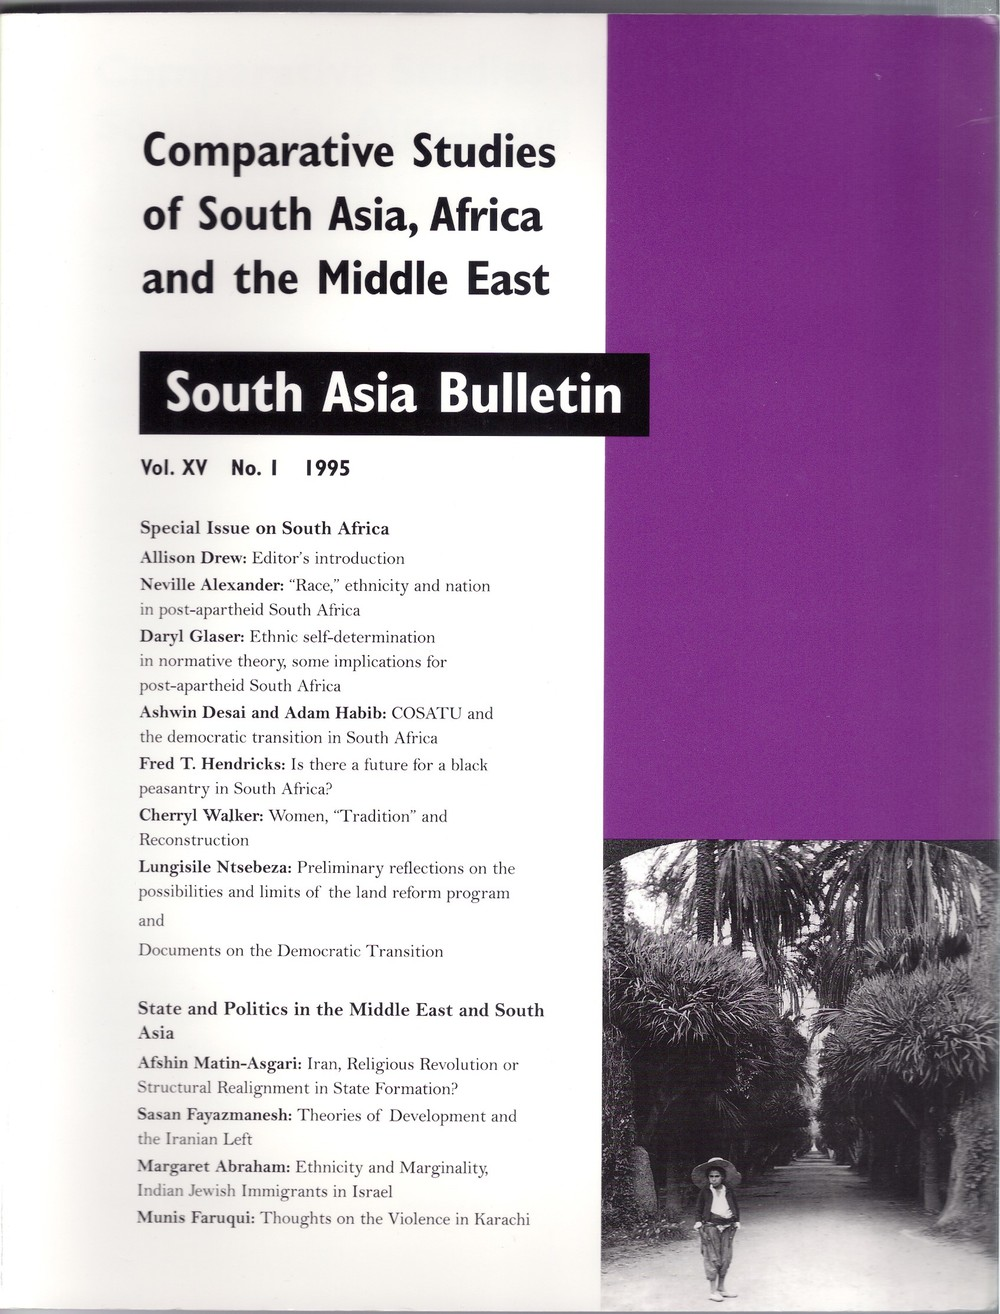 South Asia Bulletin 1995.jpg